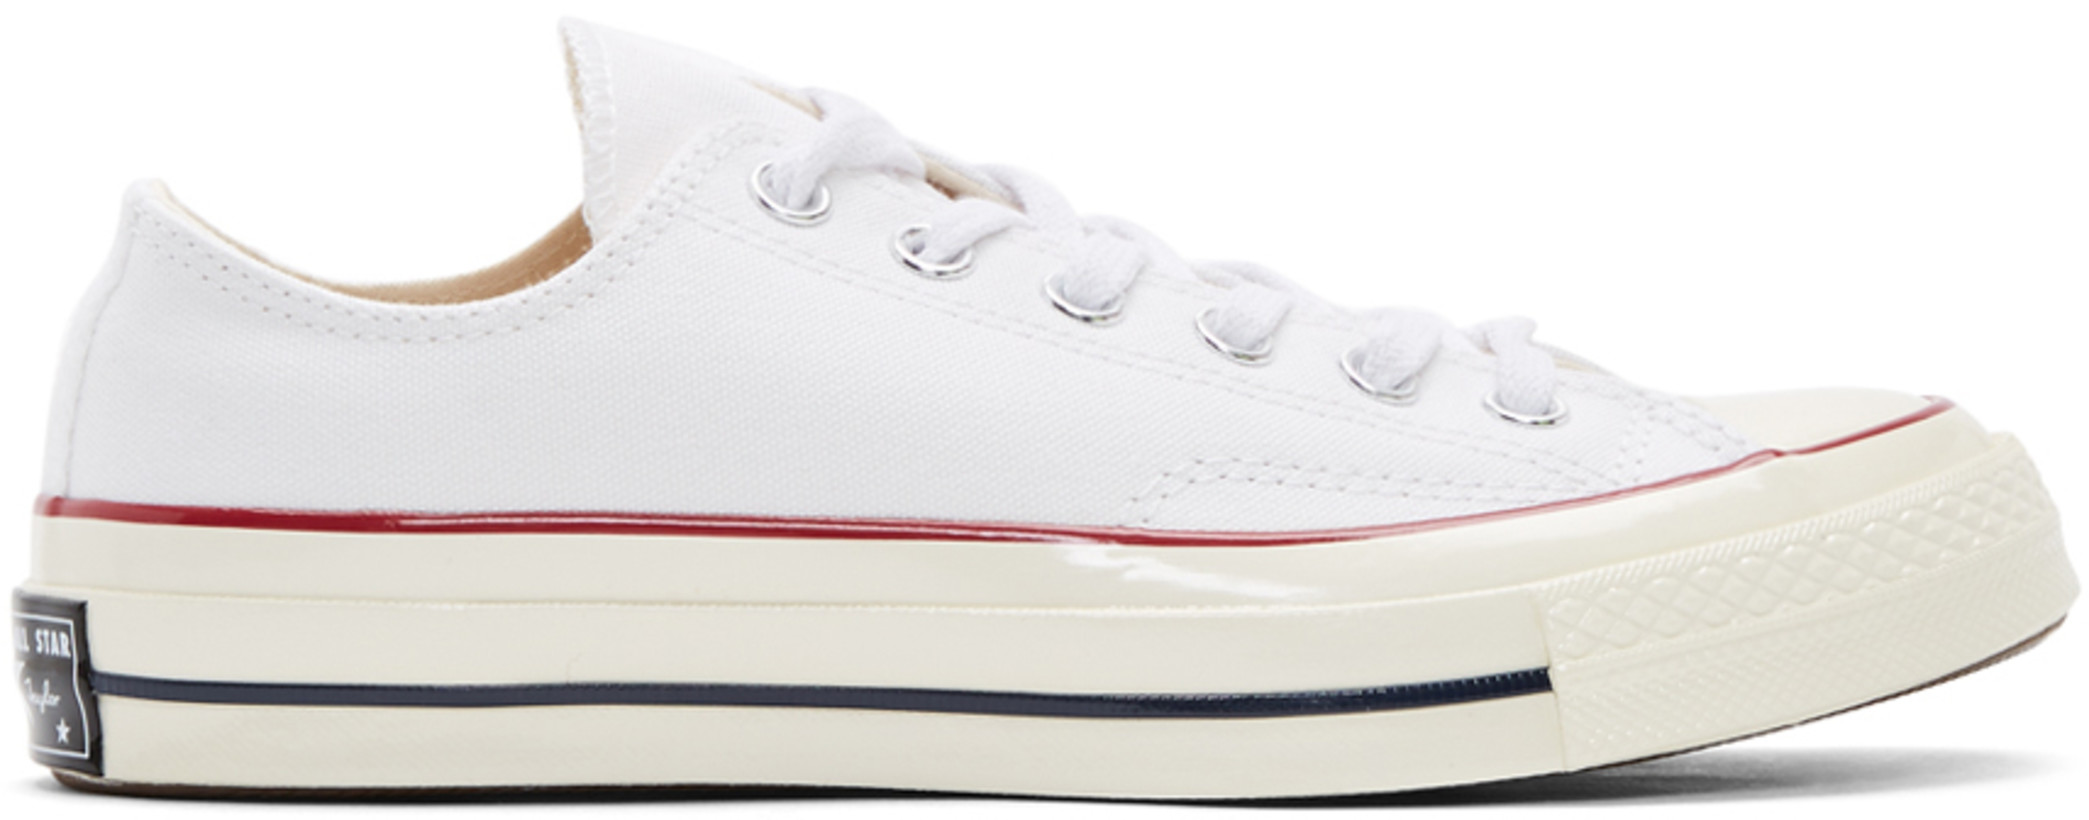 Converse ホワイト Chuck 70 ロー スニーカー メンズ ¥9000 JPY